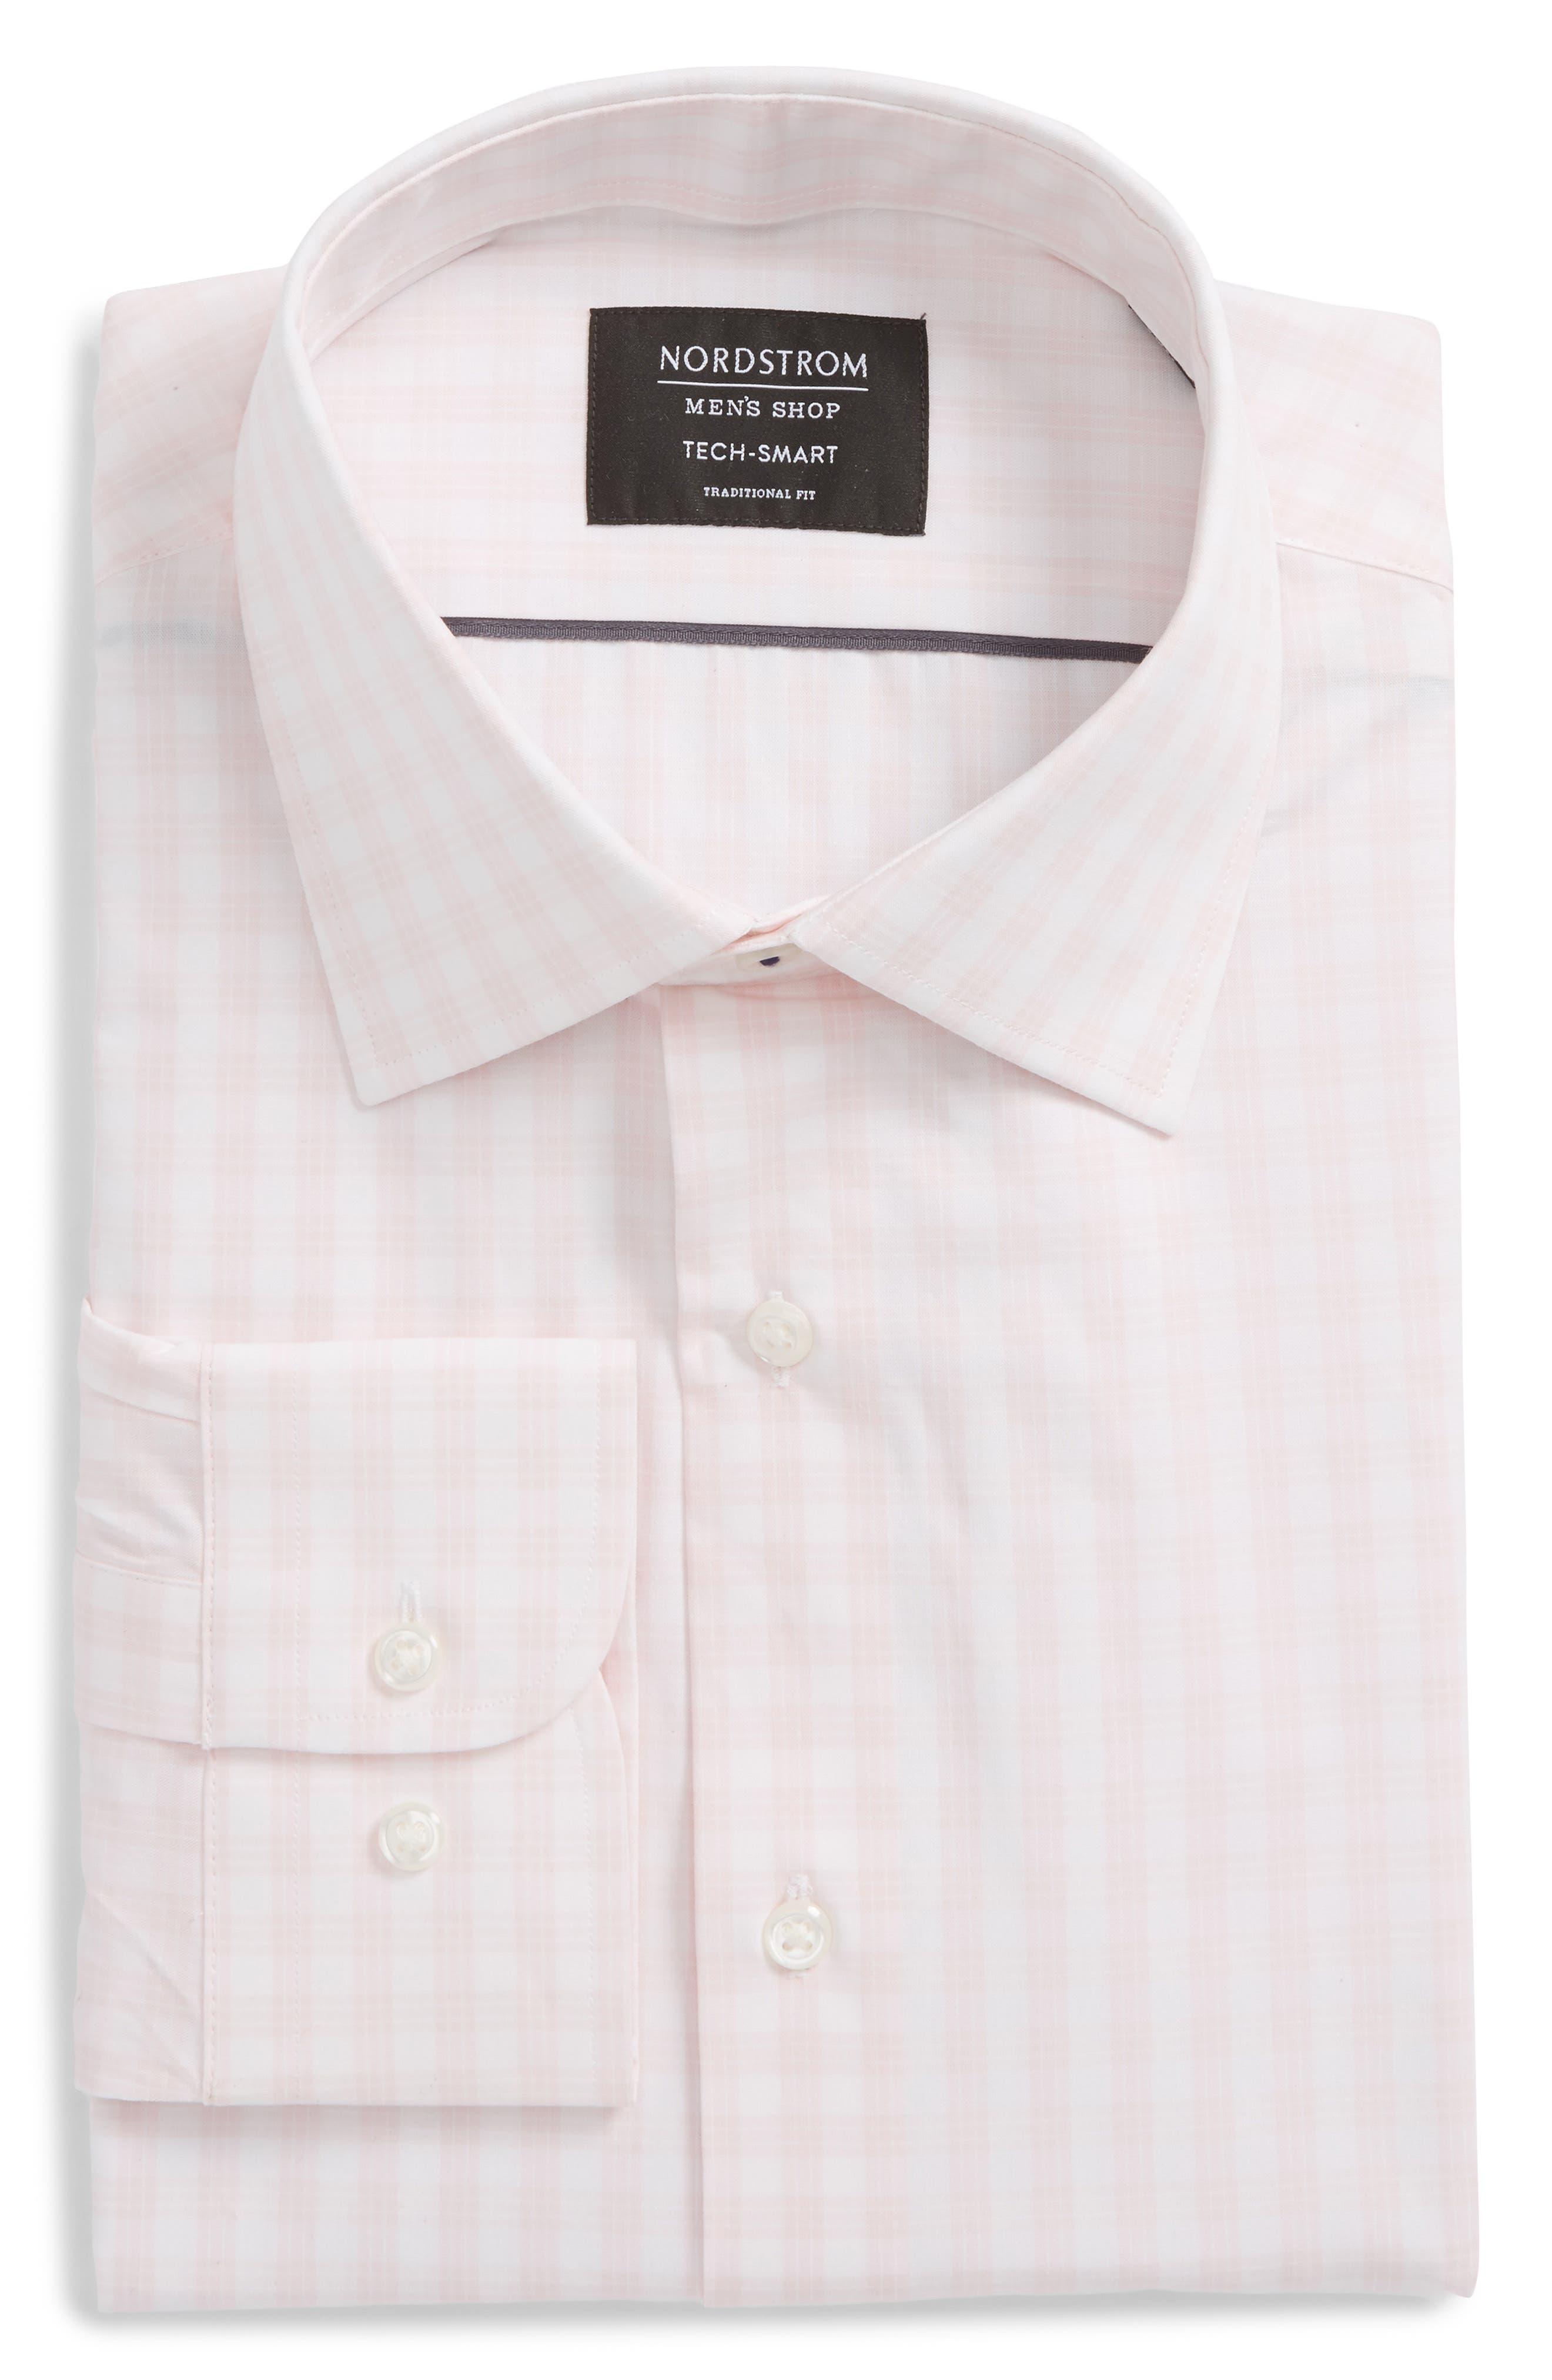 Nordstrom Men's Shop Tech Smart Traditional Fit Stretch Check Dress Shirt